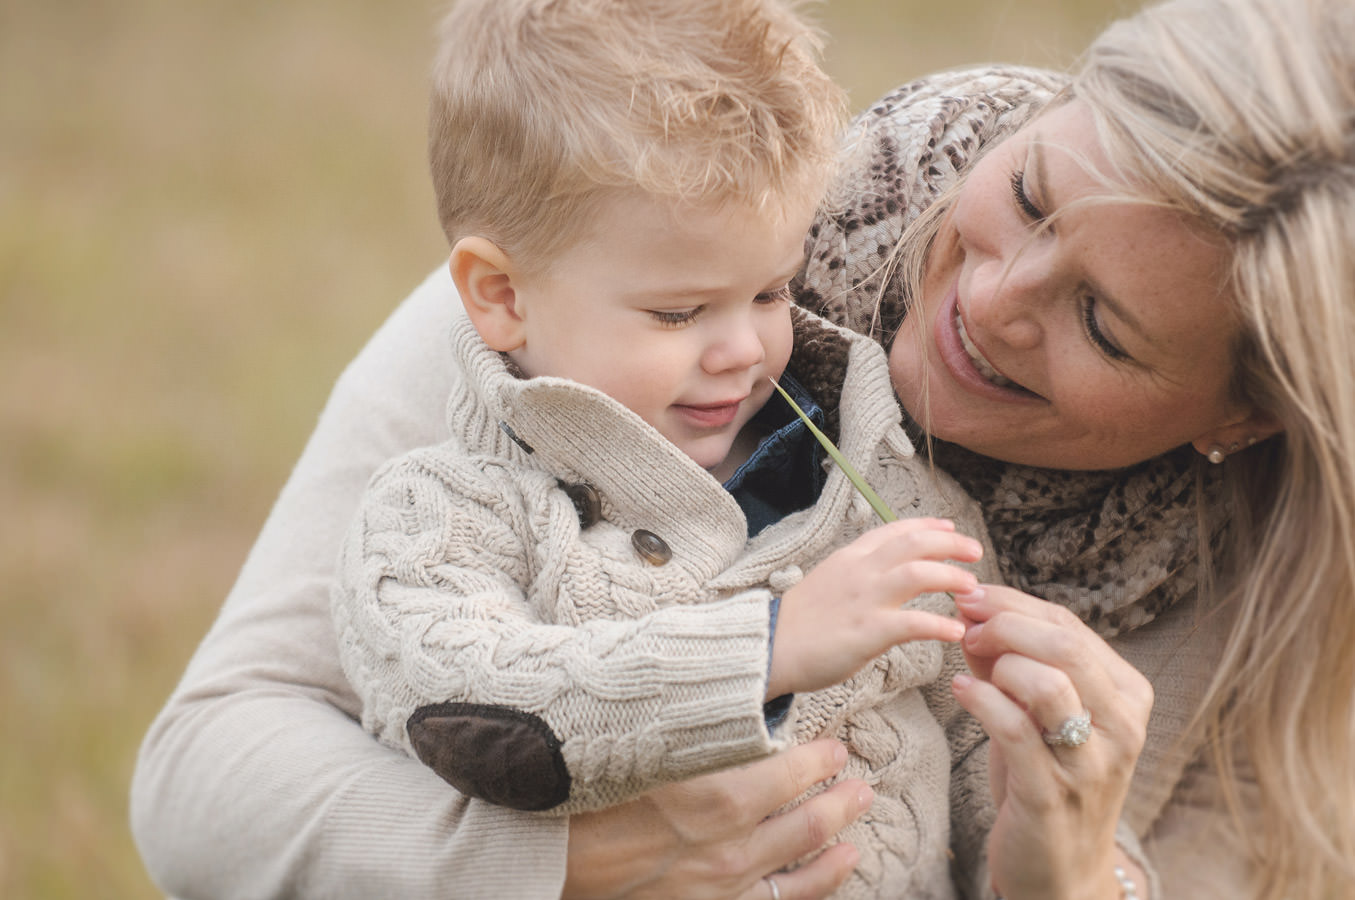 033-Niagara-Region-Family-Photographer-Grimsby-Ontario-Outdoor-Field-Portrait-Sessions.jpg